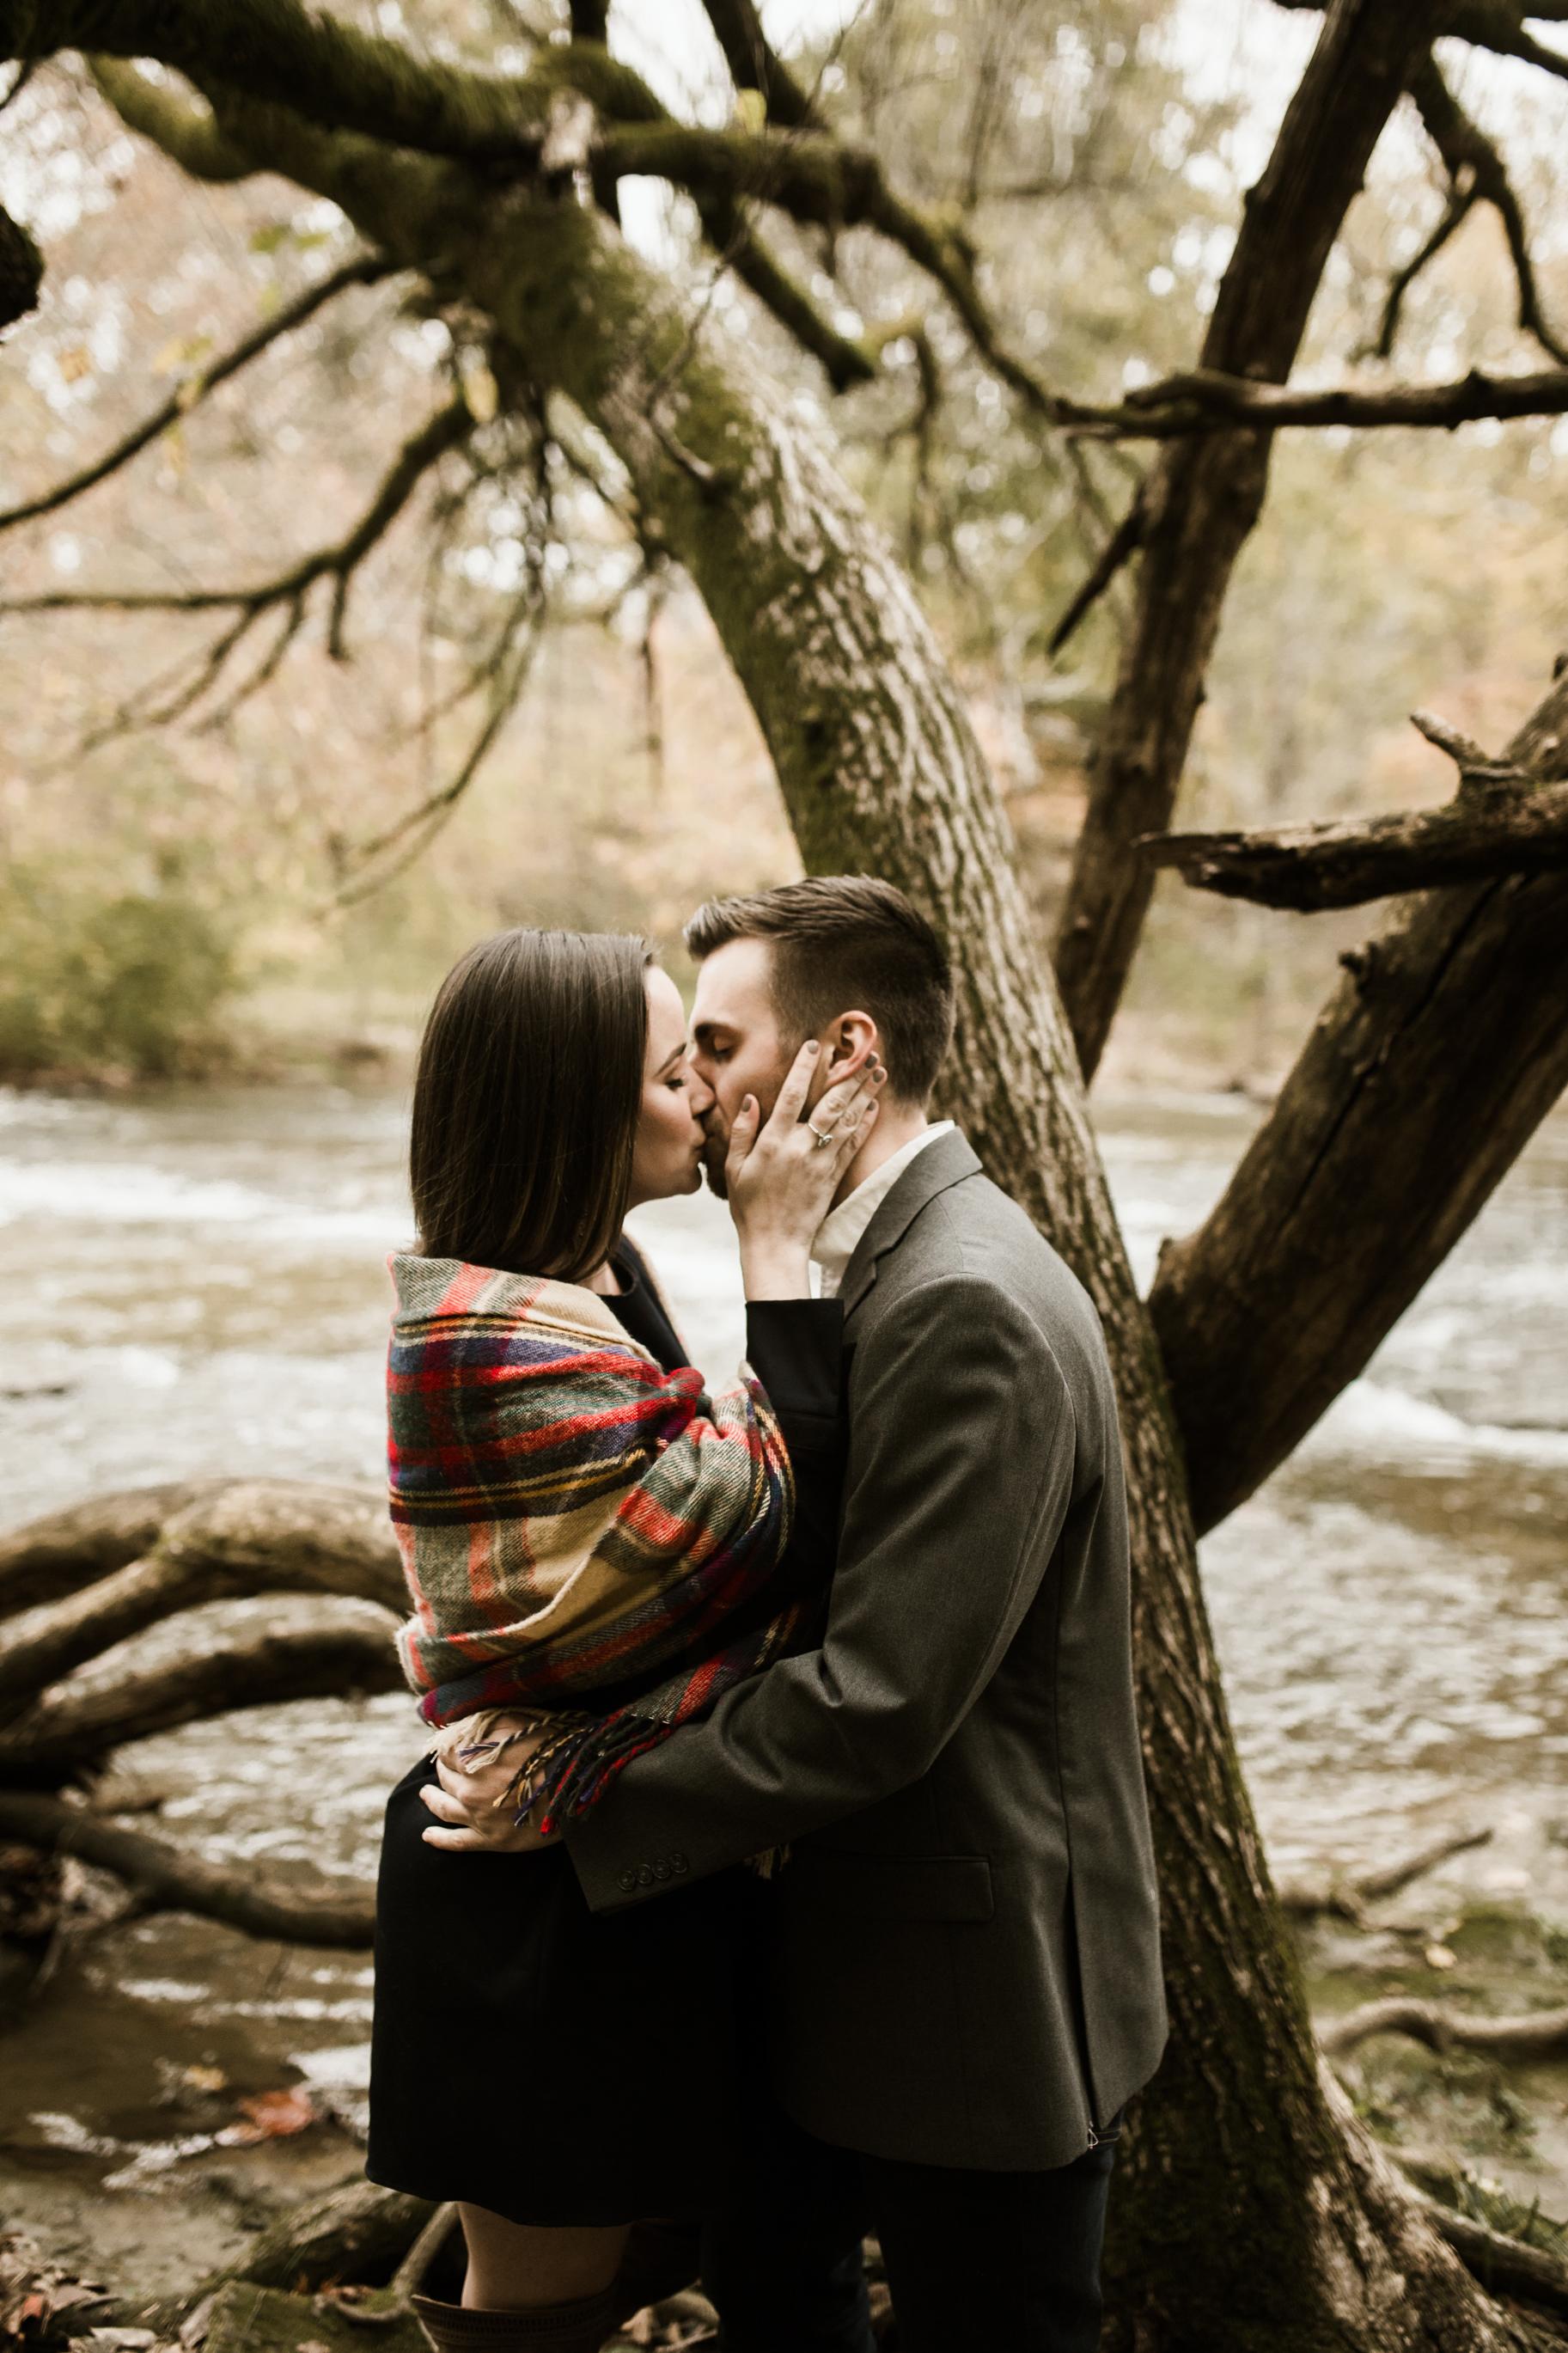 Kelsey and Daniel Engagement 2018 Crystal Ludwick Photo Louisville Wedding Photographer Kentucky Wedding Photographer (31 of 31).jpg